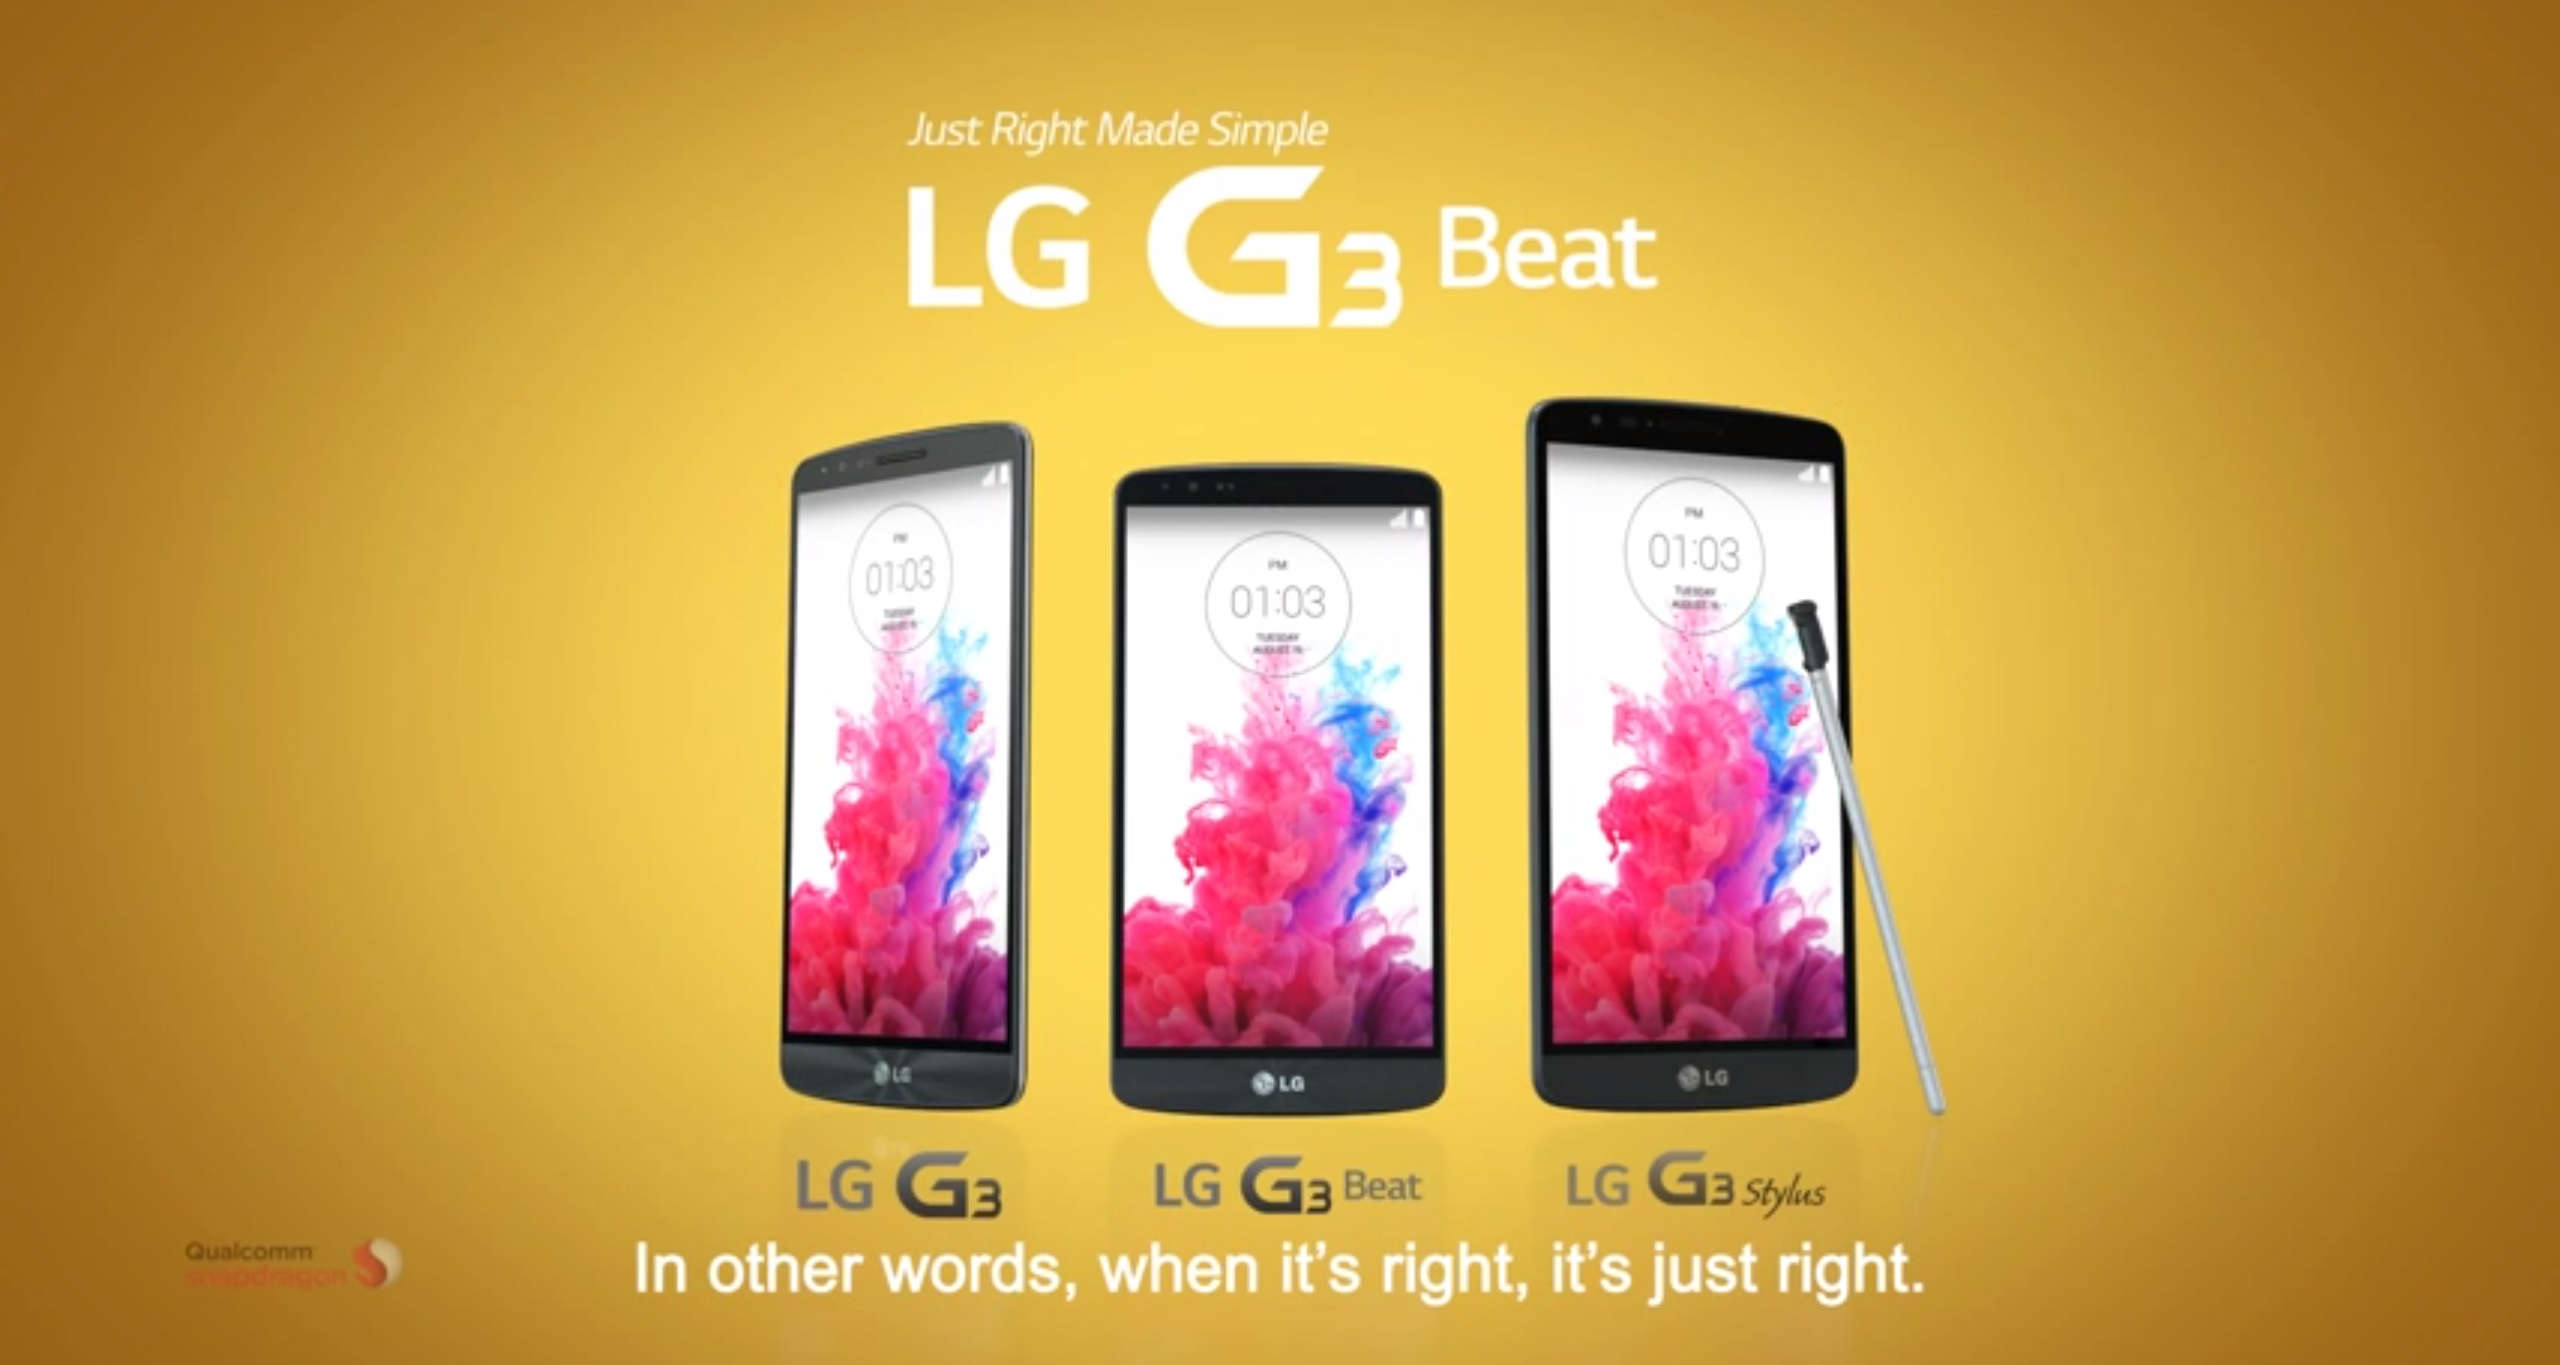 lg mobile 2014. screen shot 2014-08-05 at 12.35.10 lg mobile 2014